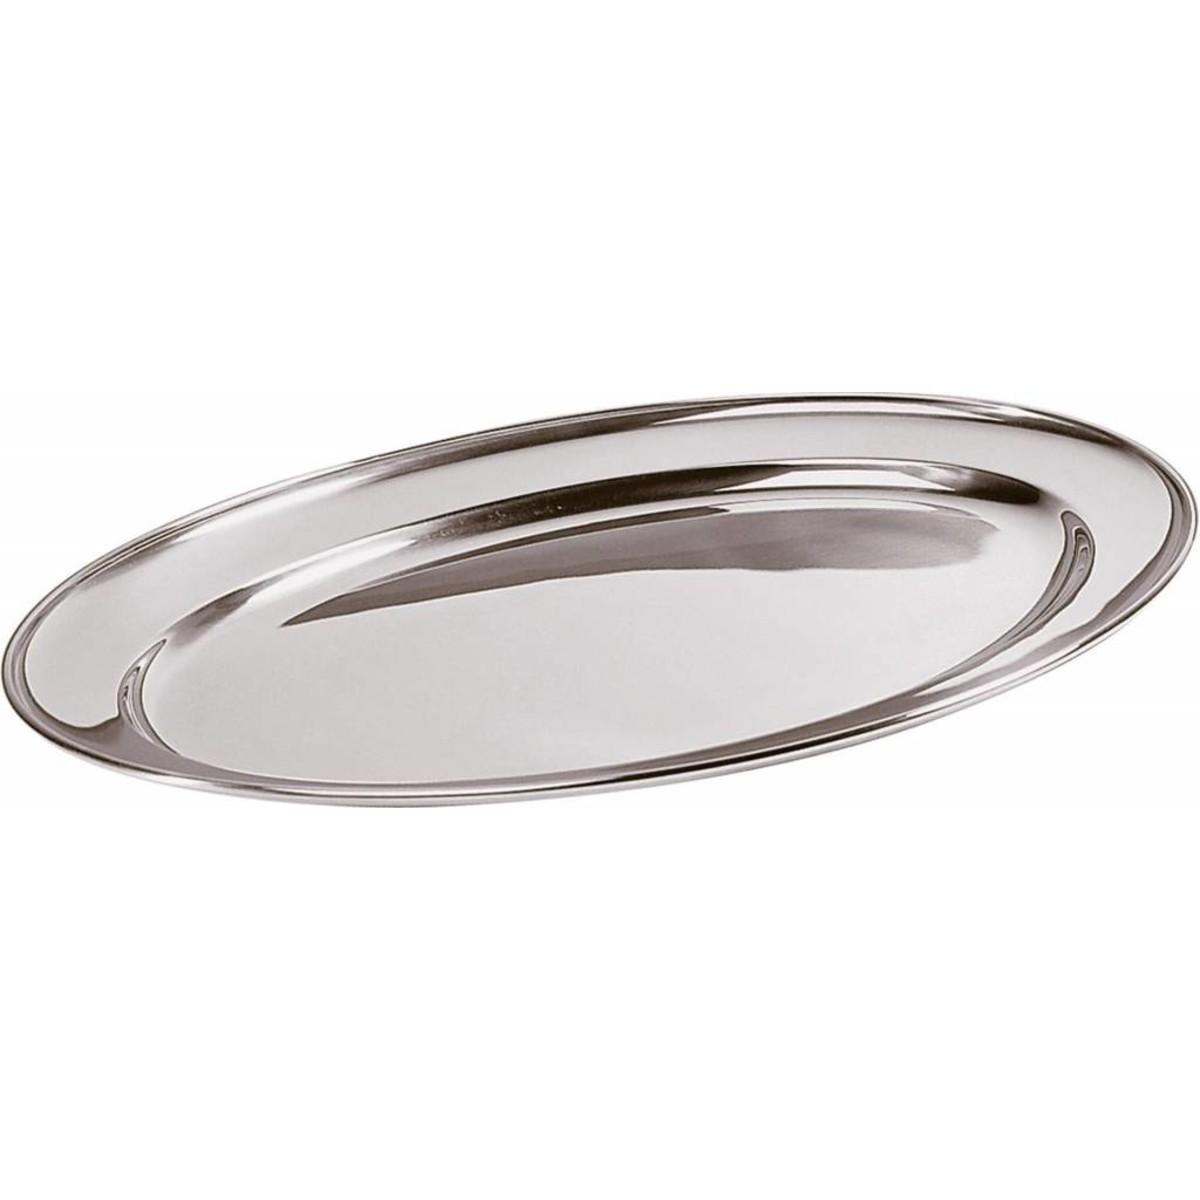 Bratenplatte/Servierplatte oval 45x29,5cm